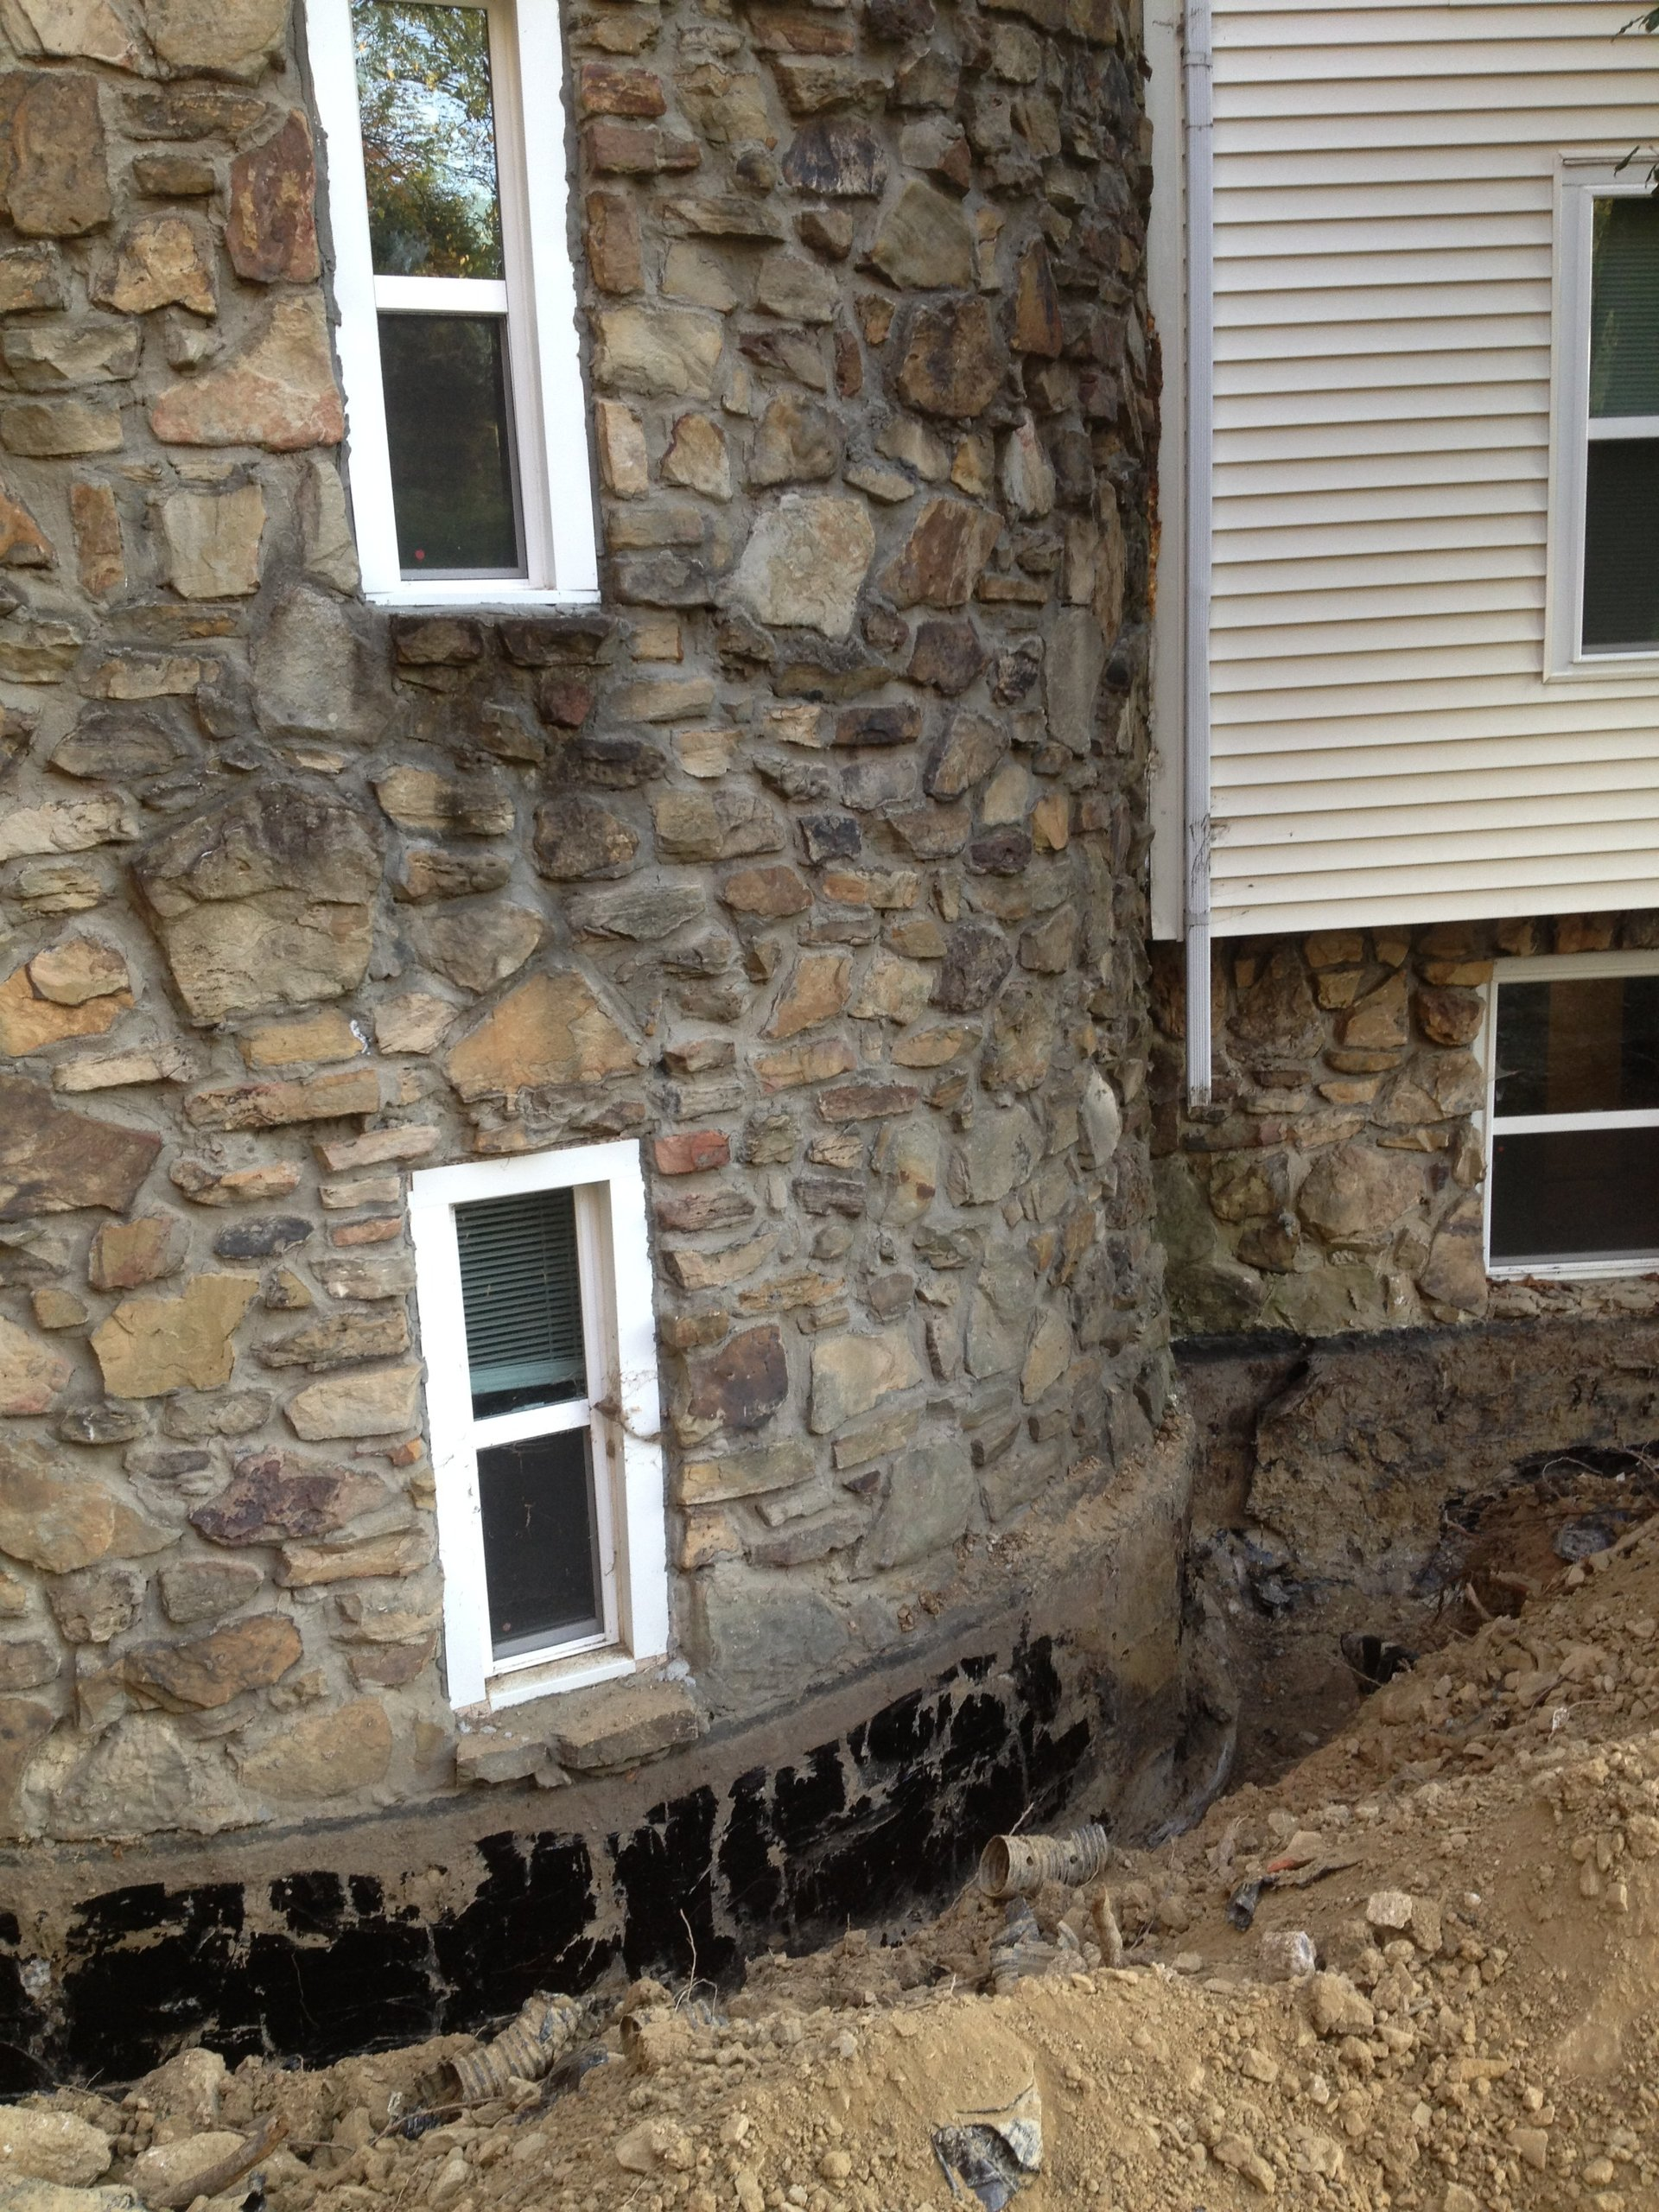 Jbs Excavating & Basement Repair image 4